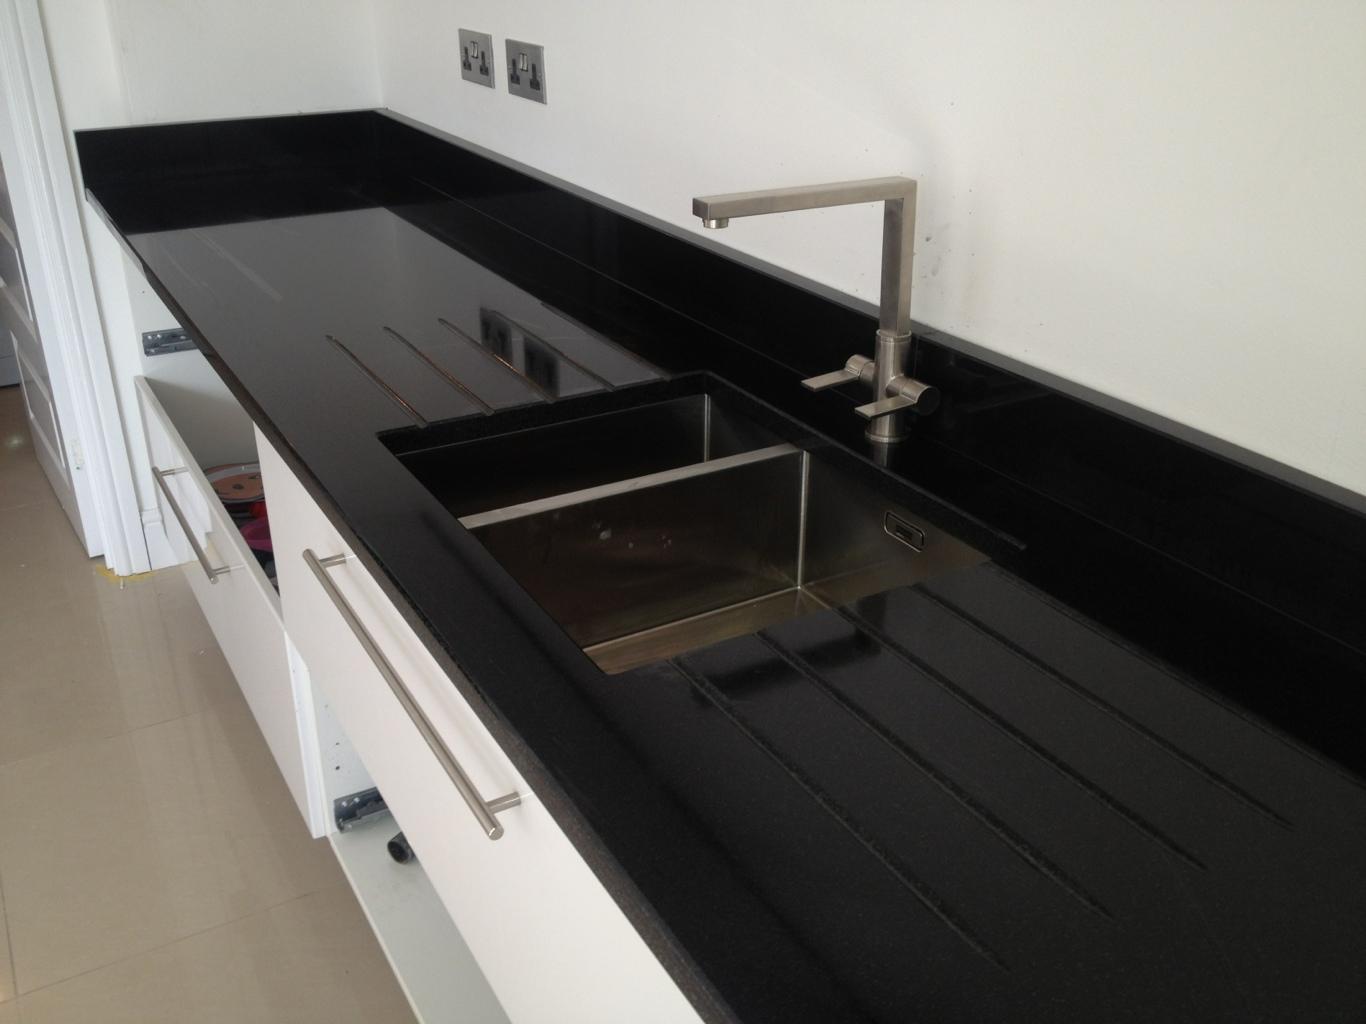 Franke Sinks Black Granite : franke peak pkx160 sink with a franke bern tap draining grooves both ...